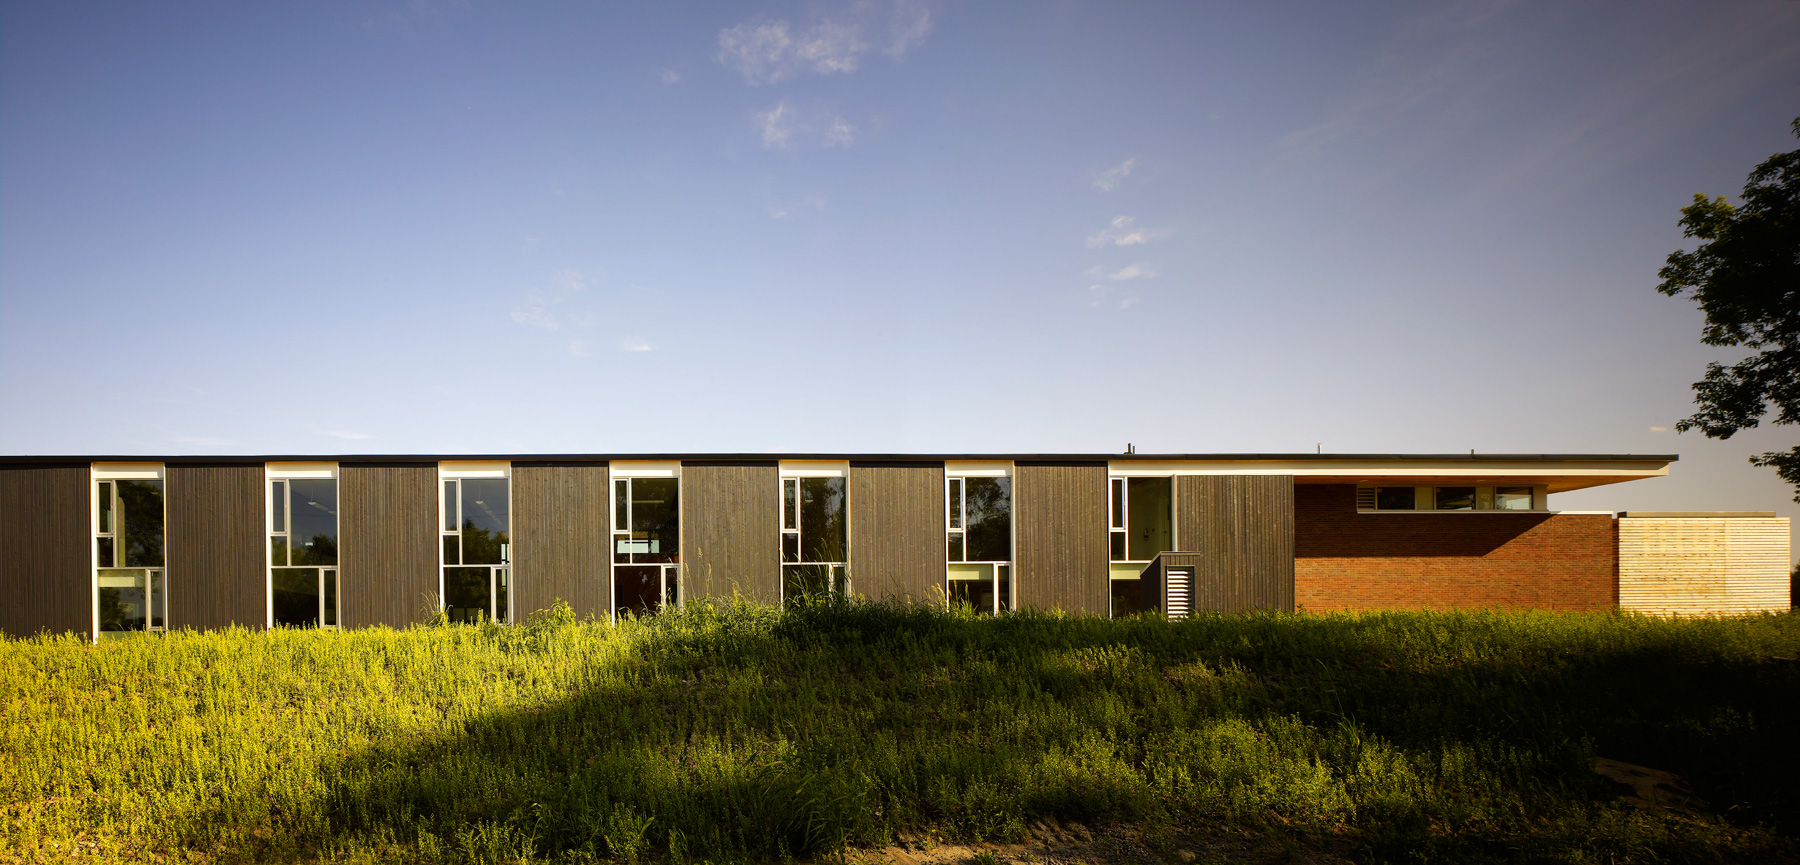 Restoration Services Centre / Montgomery Sisam Architects, © Tom Arban